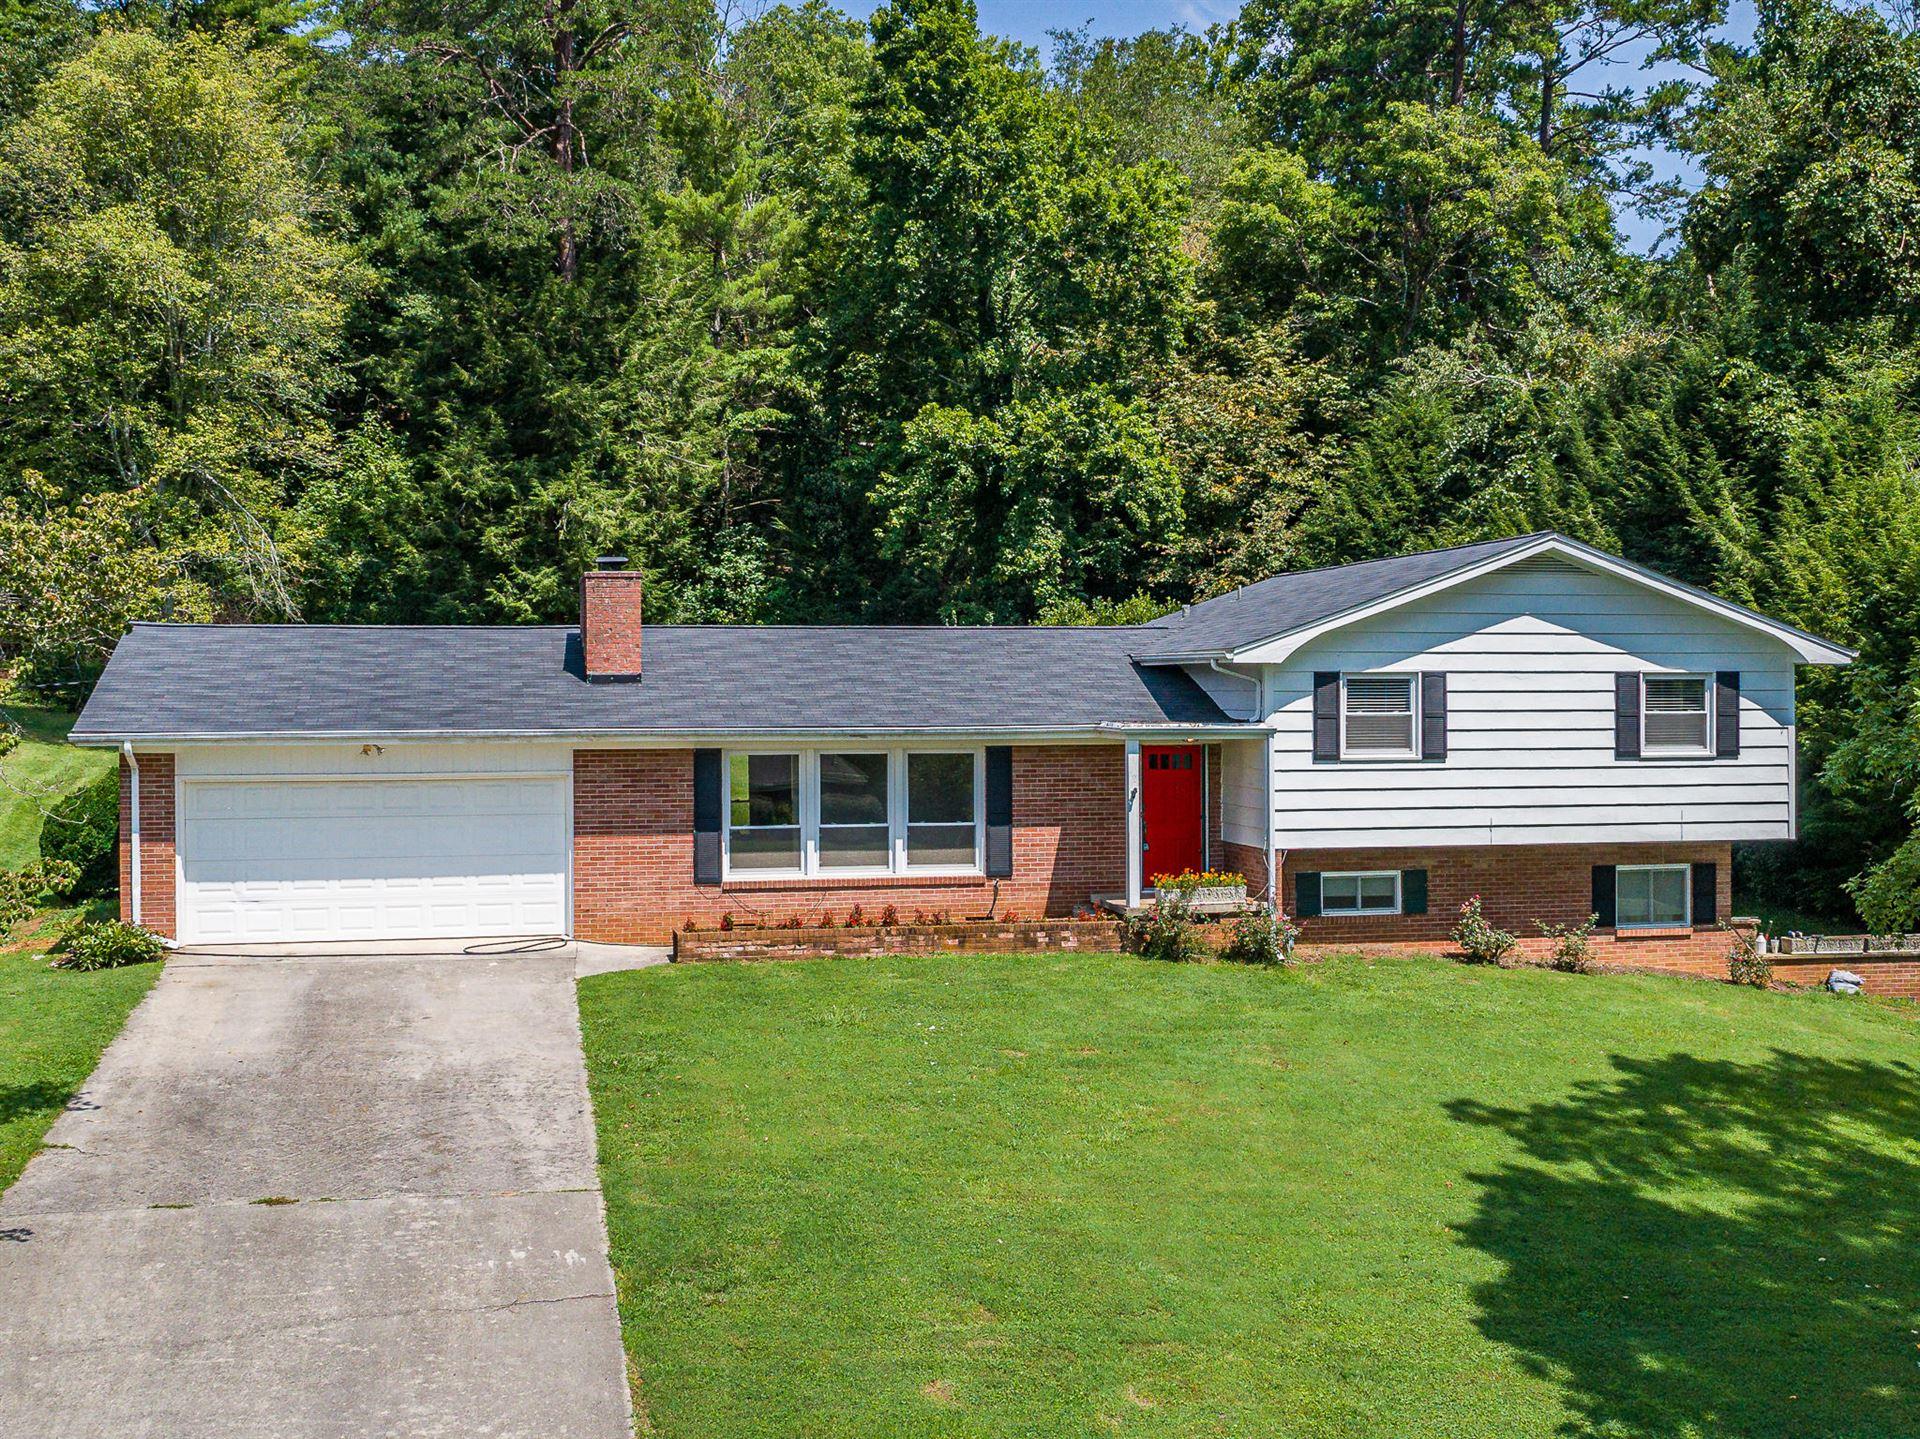 Photo of 106 Colby Rd, Oak Ridge, TN 37830 (MLS # 1126891)